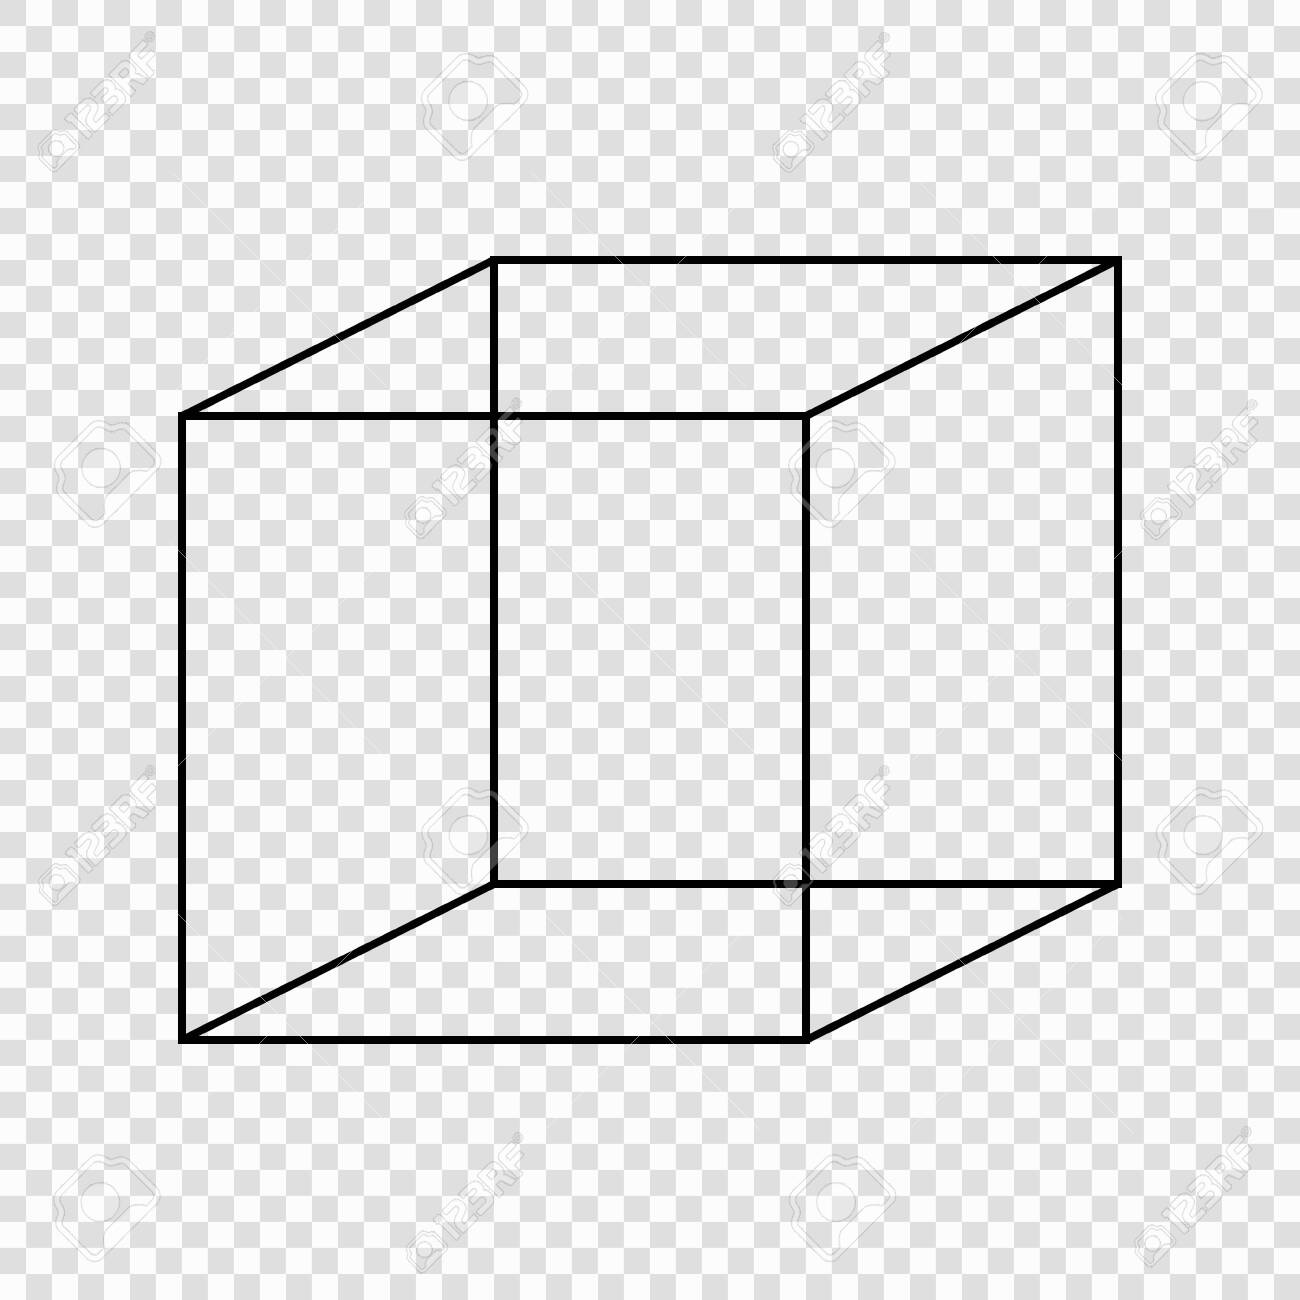 Necker cube optical illusion. Vector illustration - 139622264